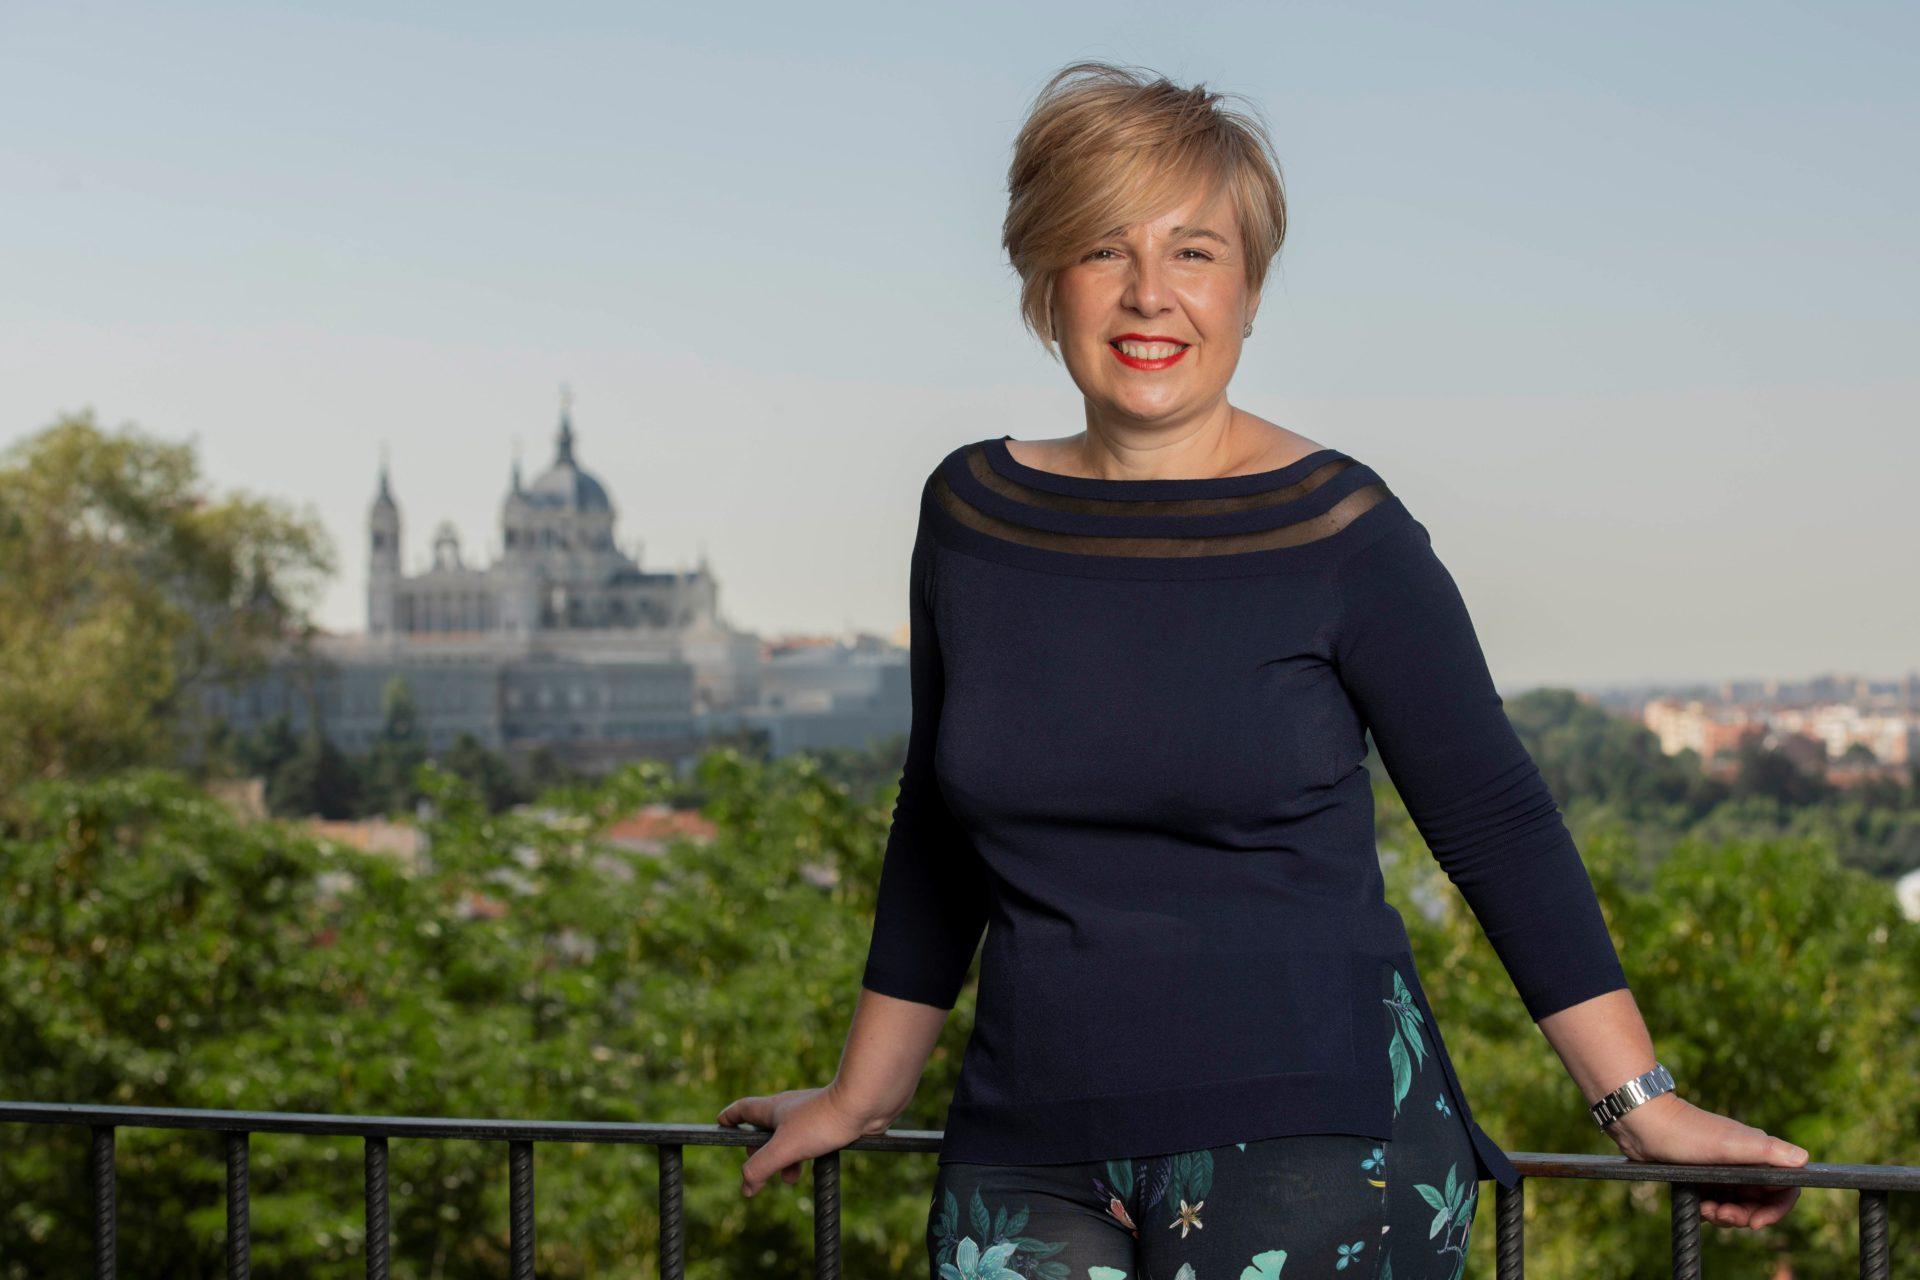 Mariola Urrea